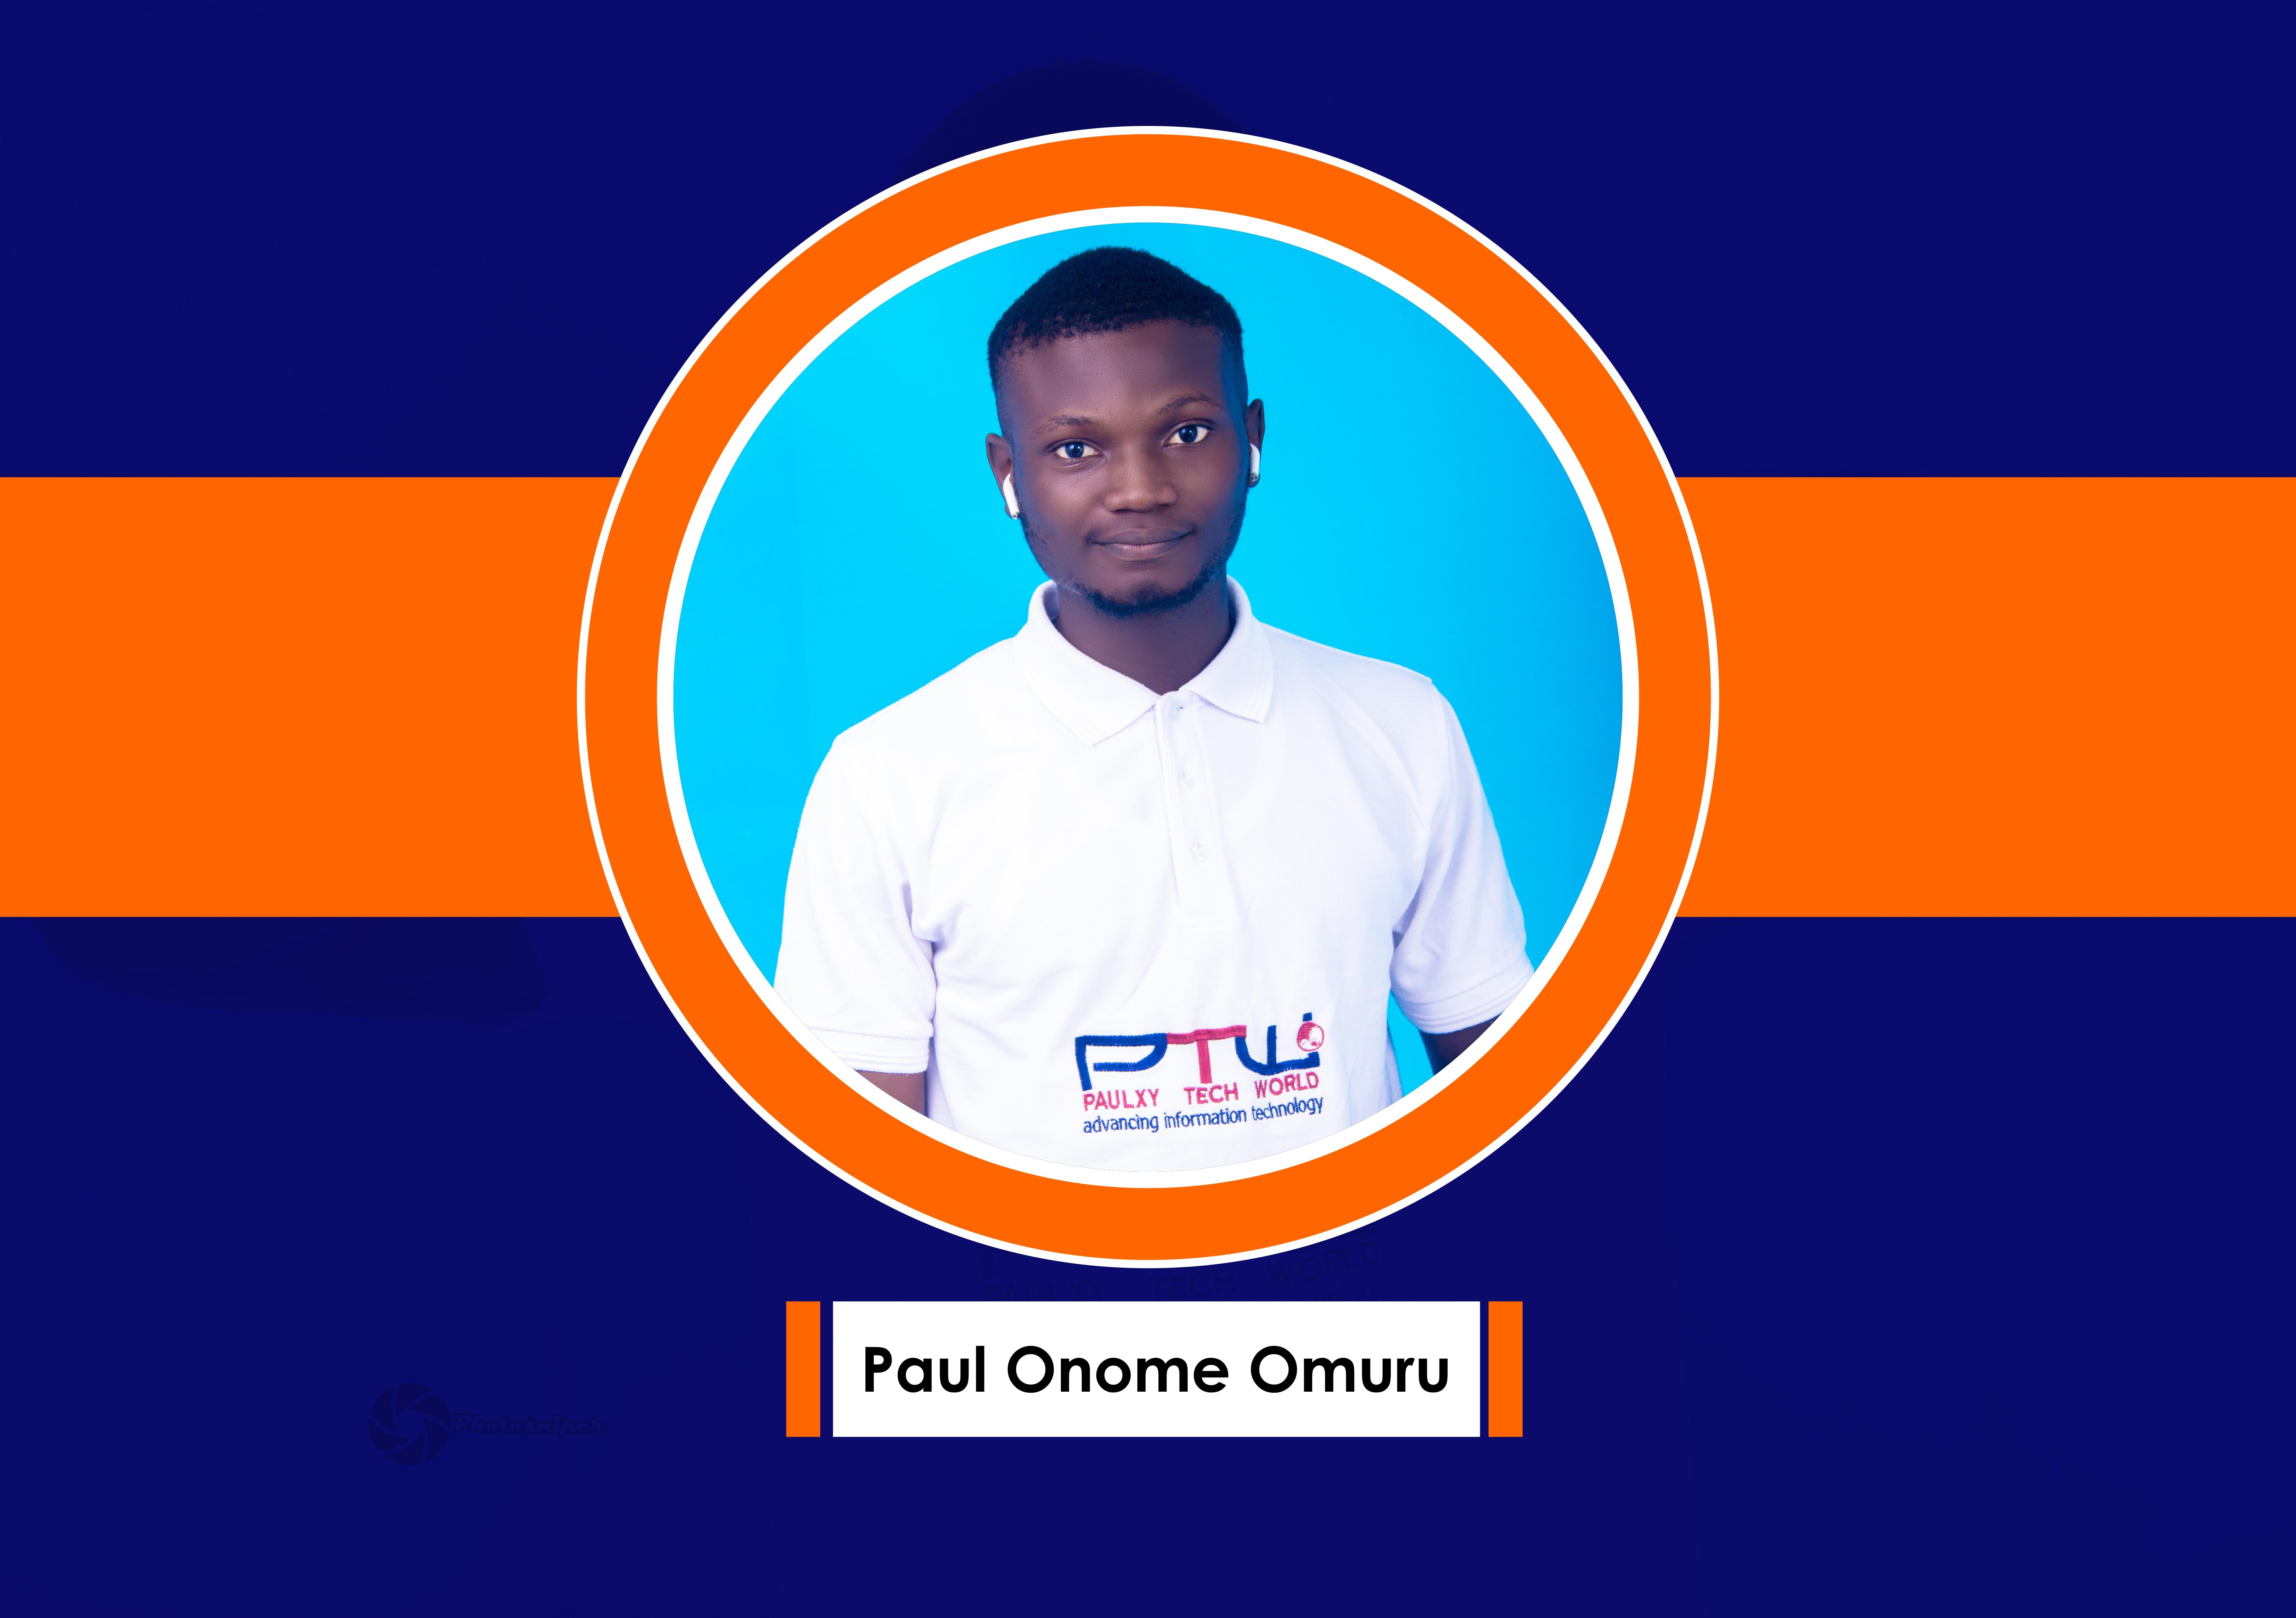 Paul Onome Omuru